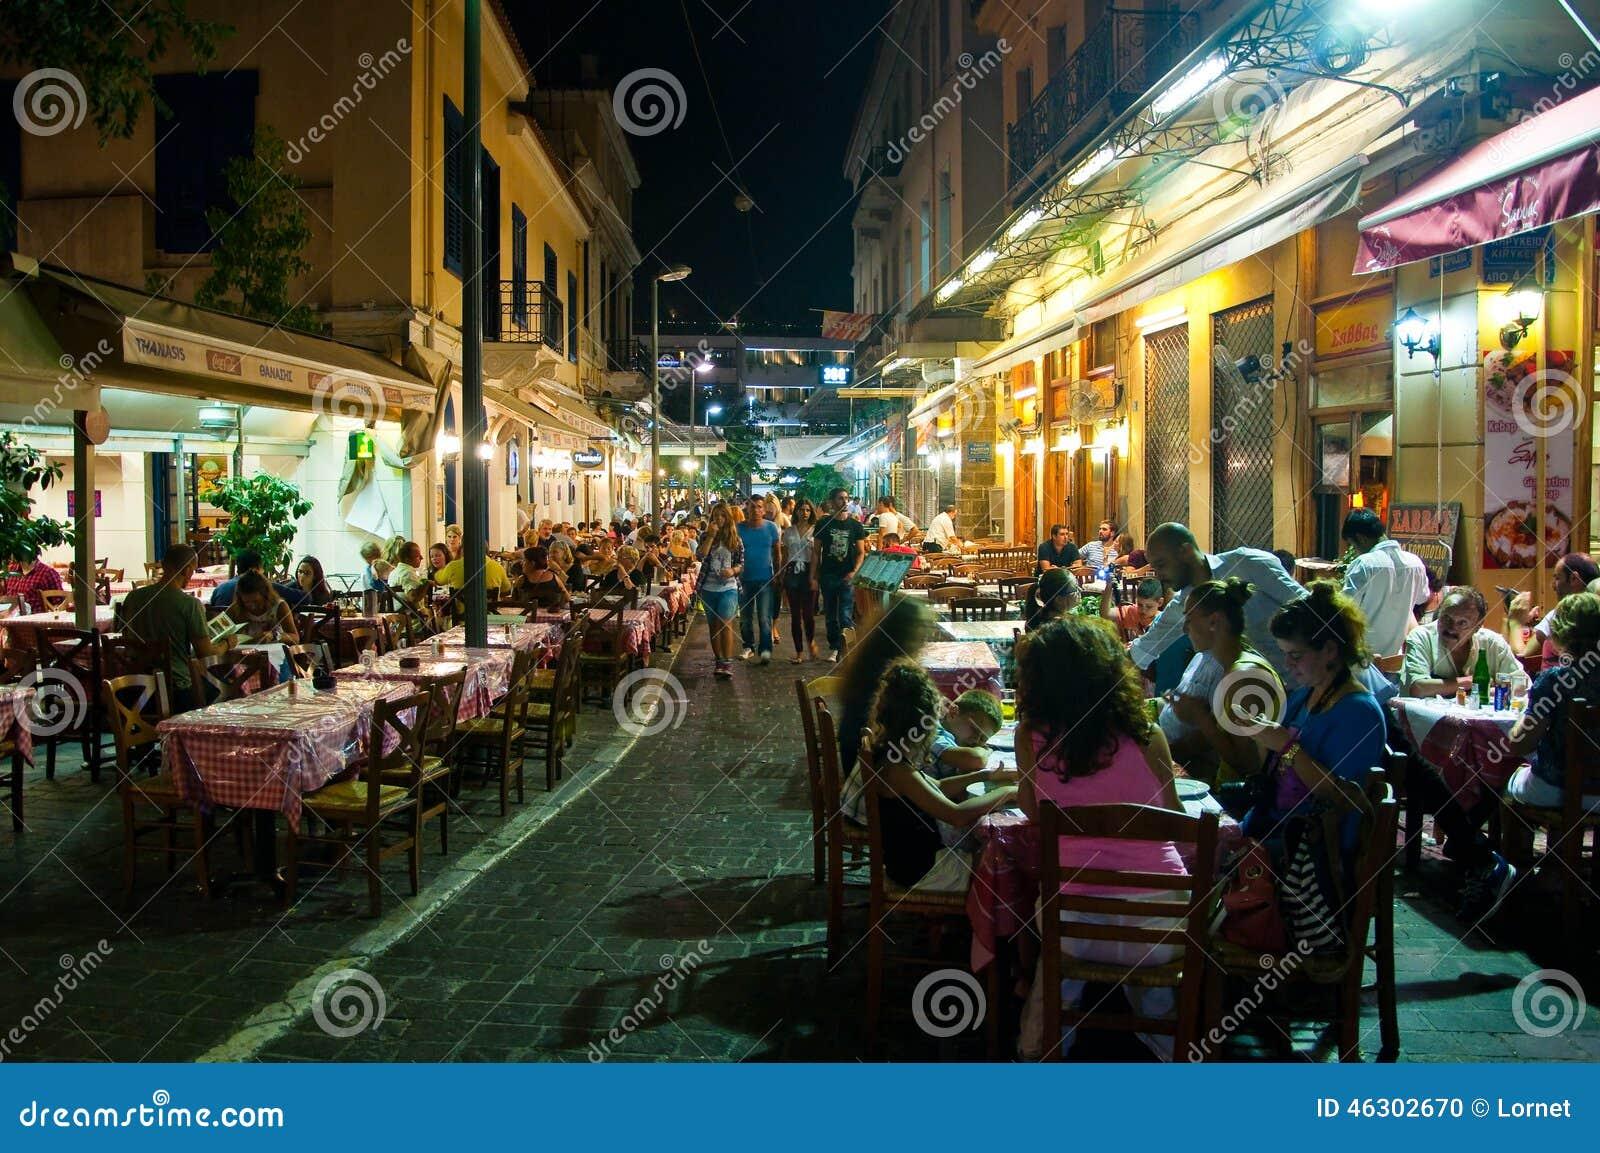 АФИН 22-ОЕ АВГУСТА: Улица с различными ресторанами и барами на зоне Plaka, около к квадрата Monastiraki 22-ого августа 2014 в Афи